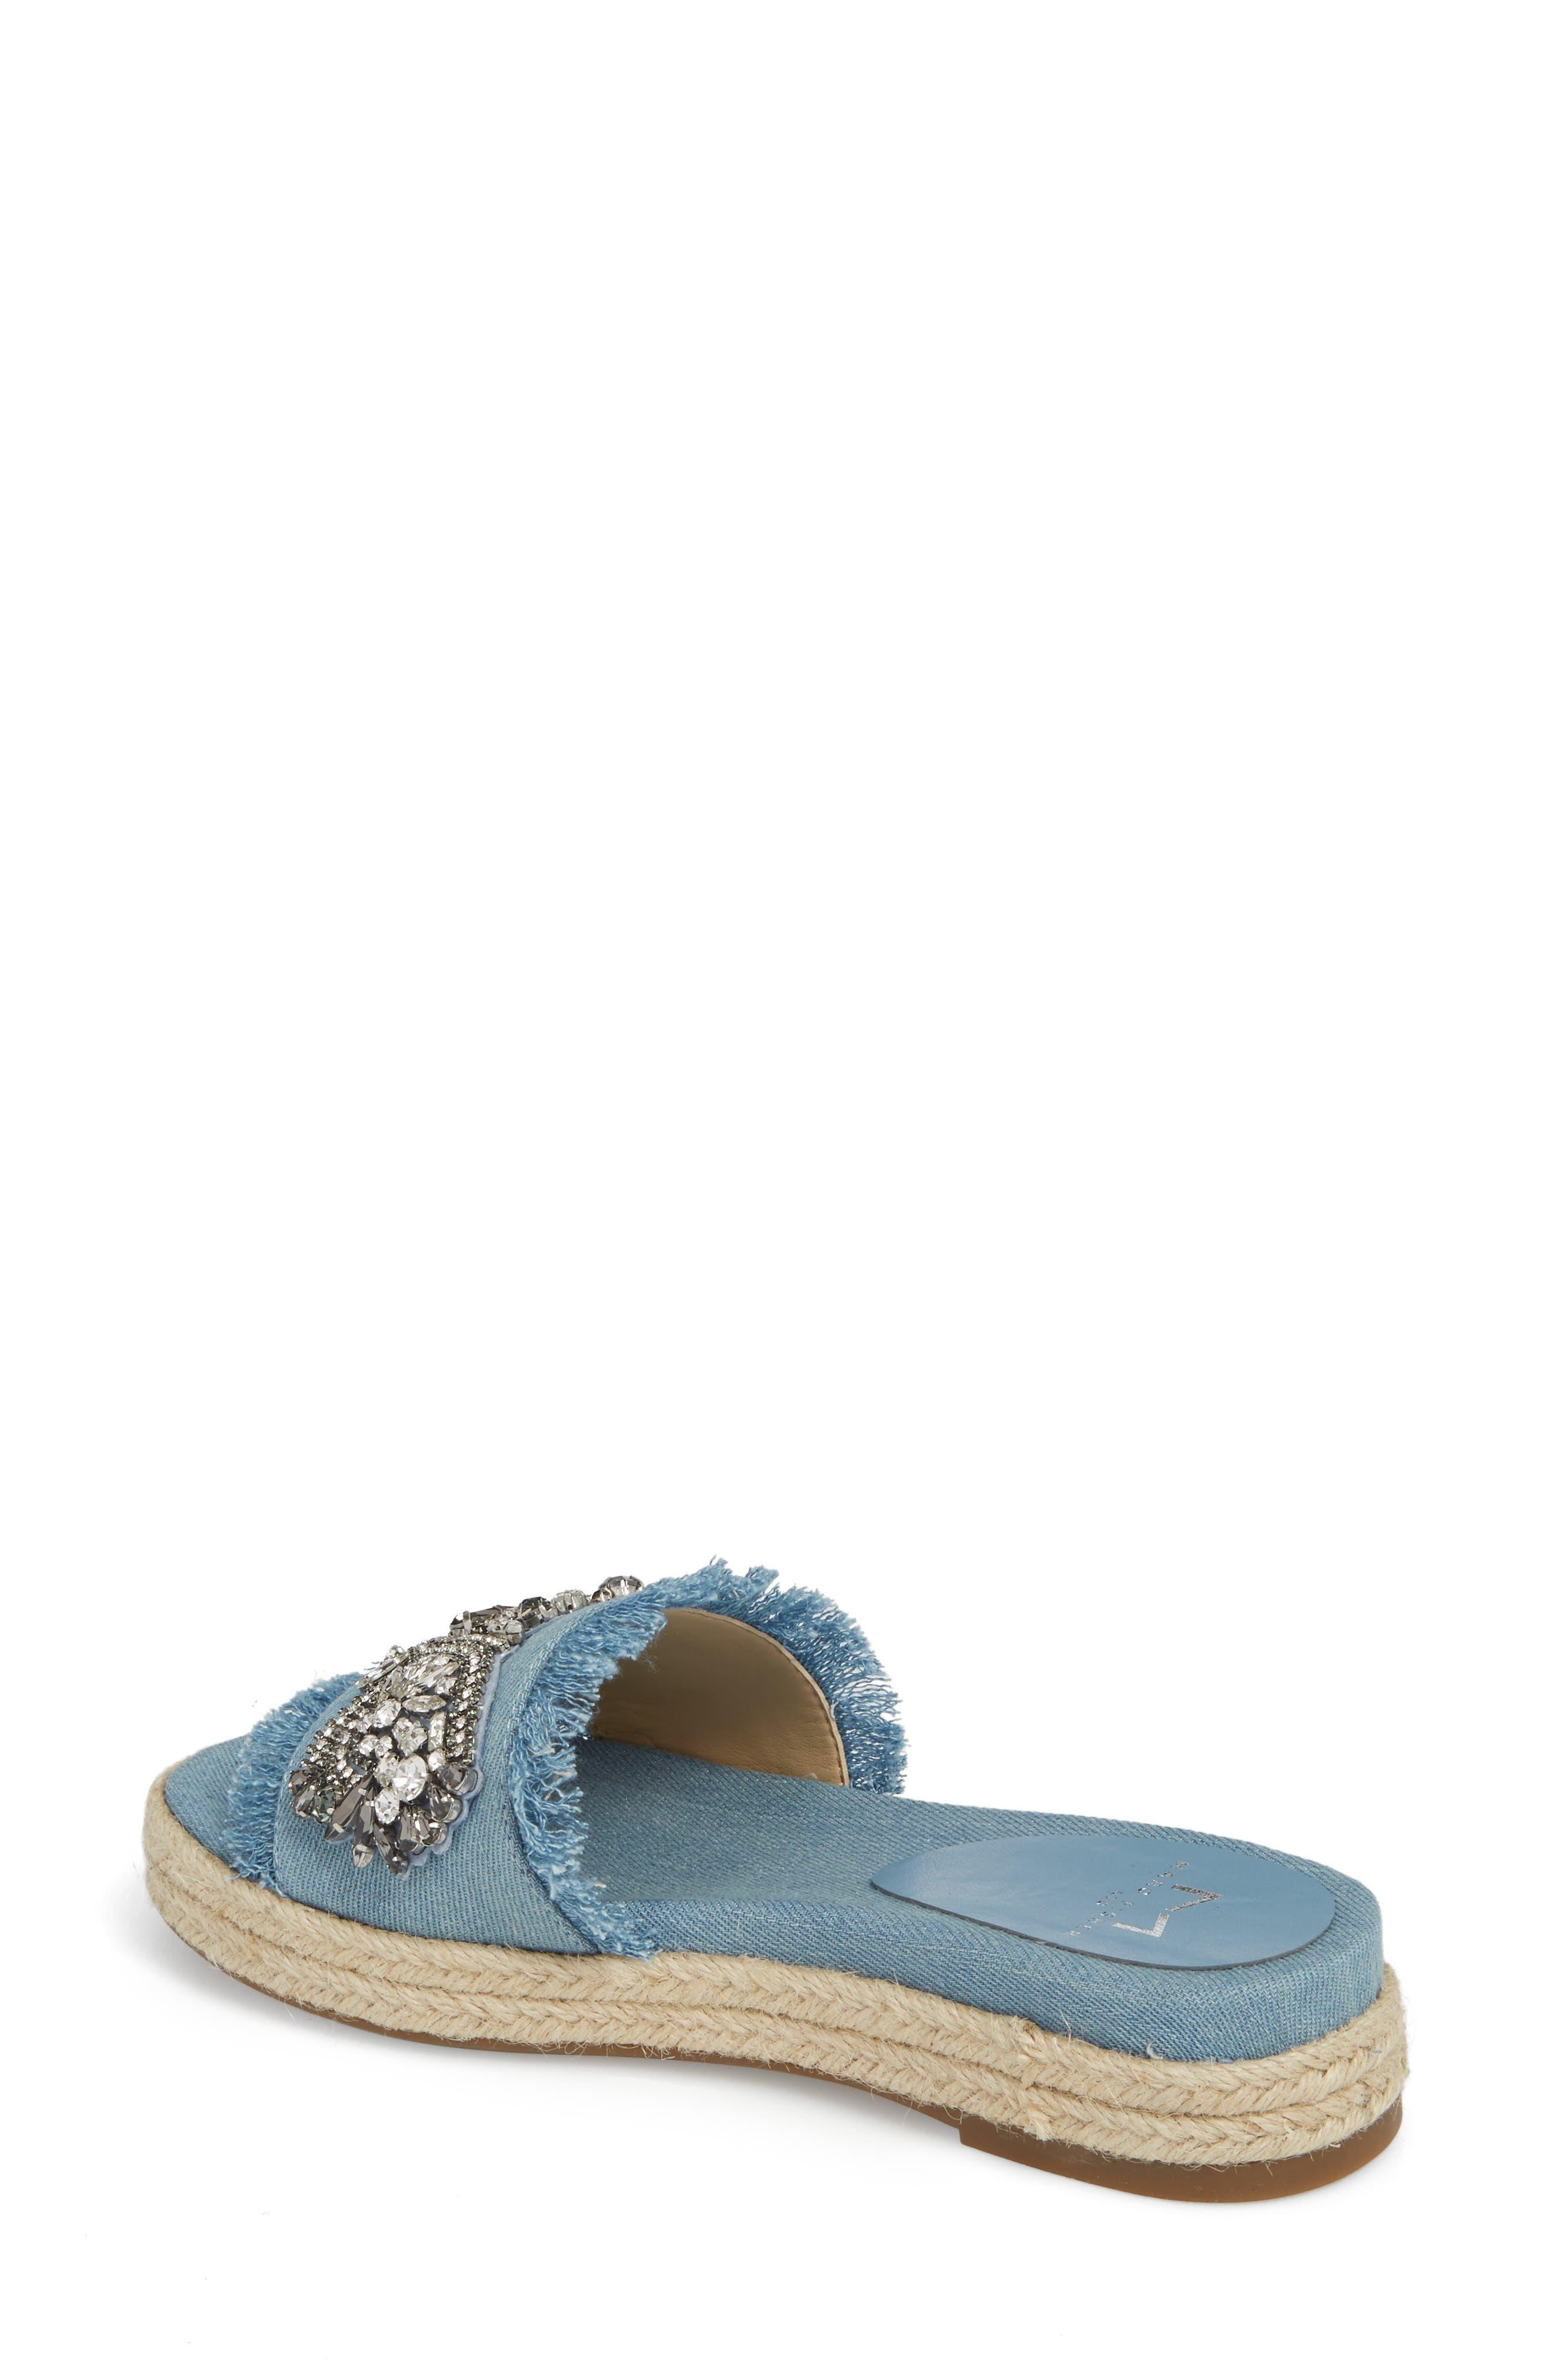 Jelly II Embellished Sandal,                             Alternate thumbnail 4, color,